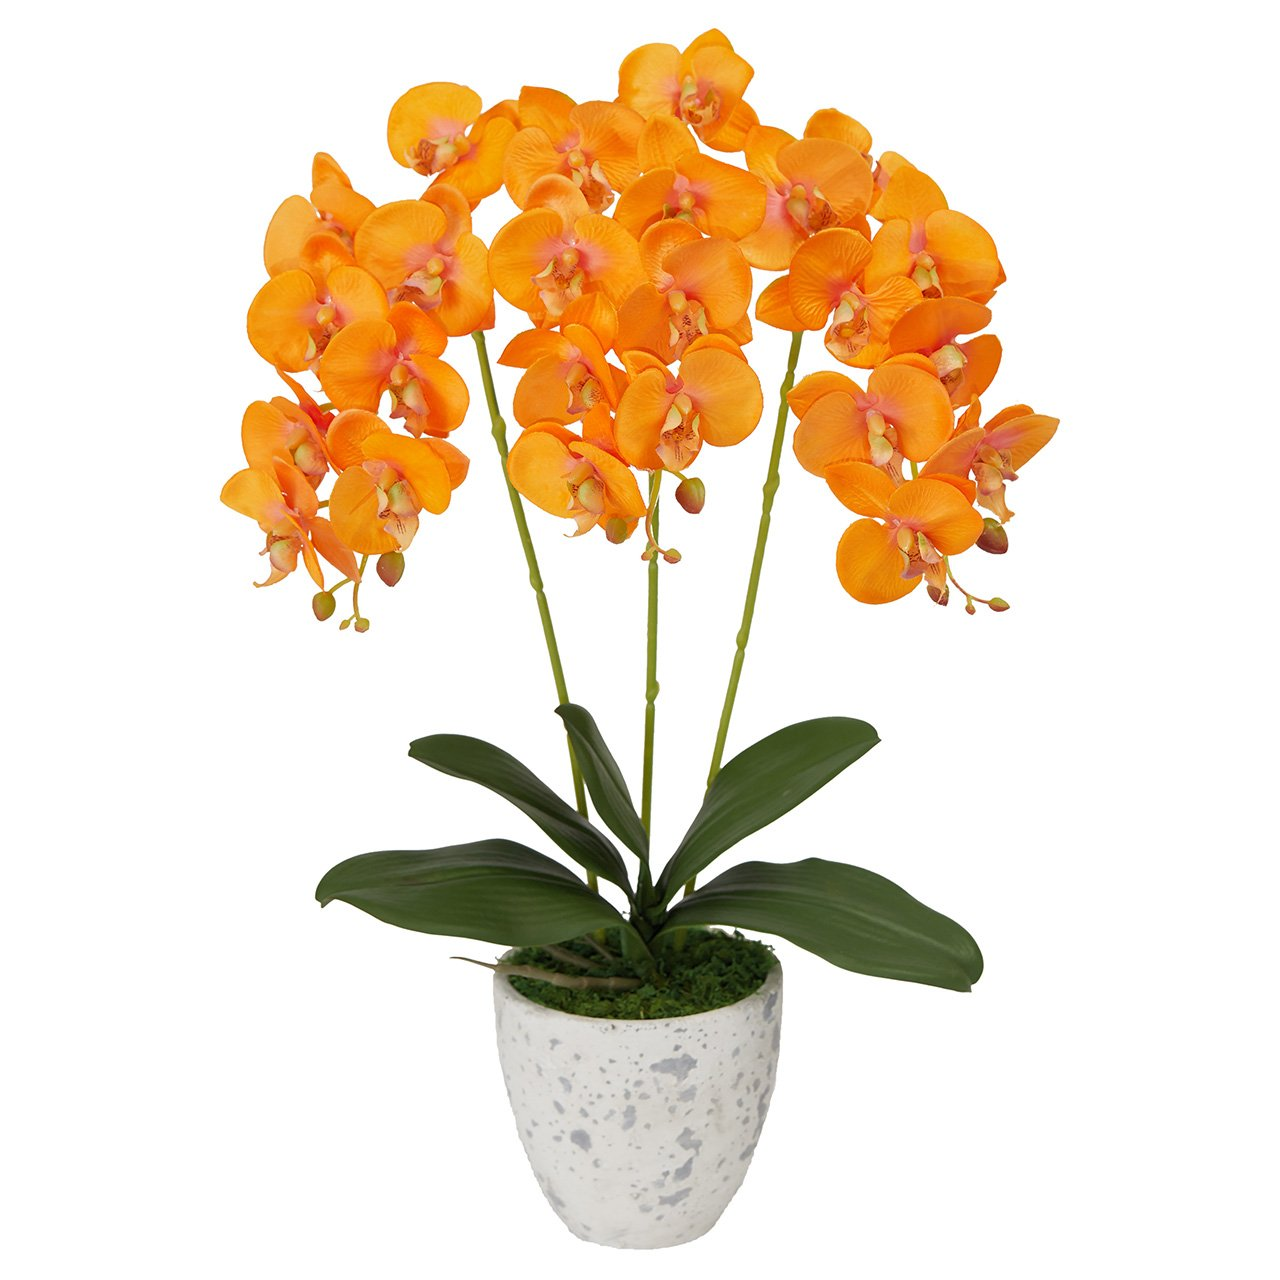 MAGIQ 東京堂 上質な造花 ピュアオーキッド3本立て 光触媒 #オレンジ ZV008080-009 B07B4DD82B オレンジ オレンジ